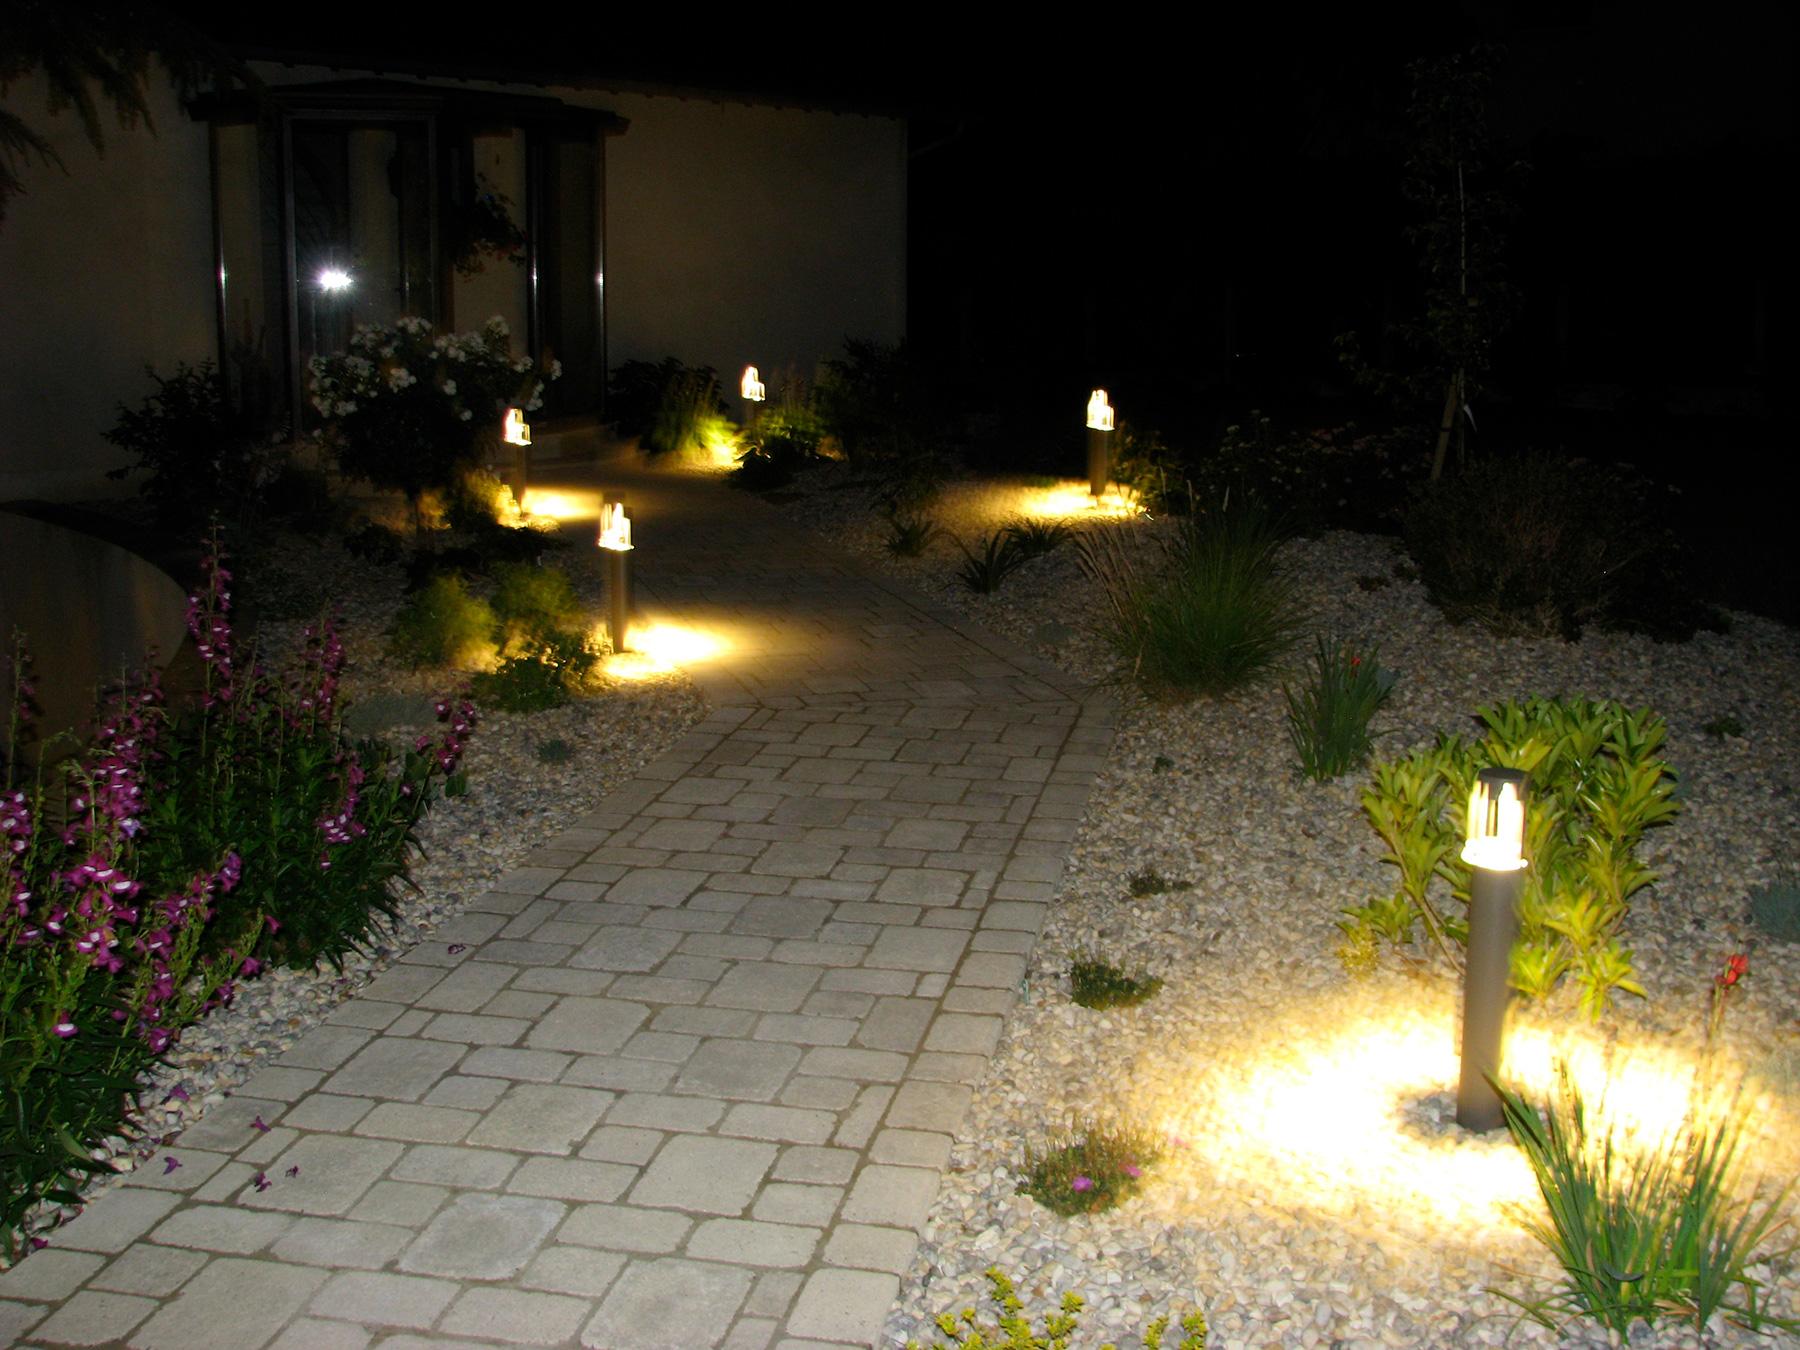 Eclairage De Terrasse Exterieur eclairage exterieur terrasse - eclairage exterieur led